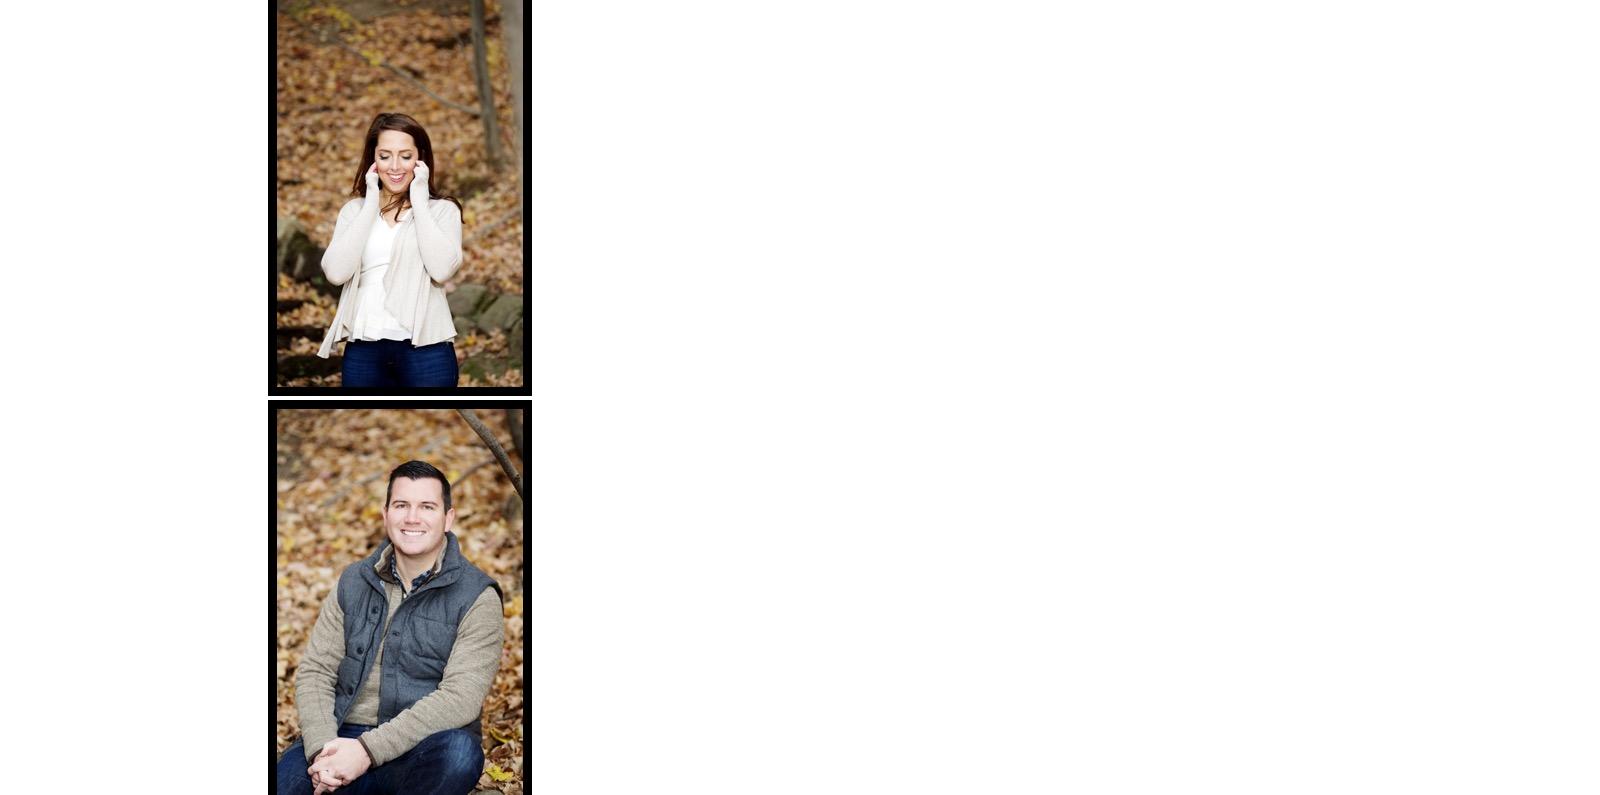 Letchworth engagement photos